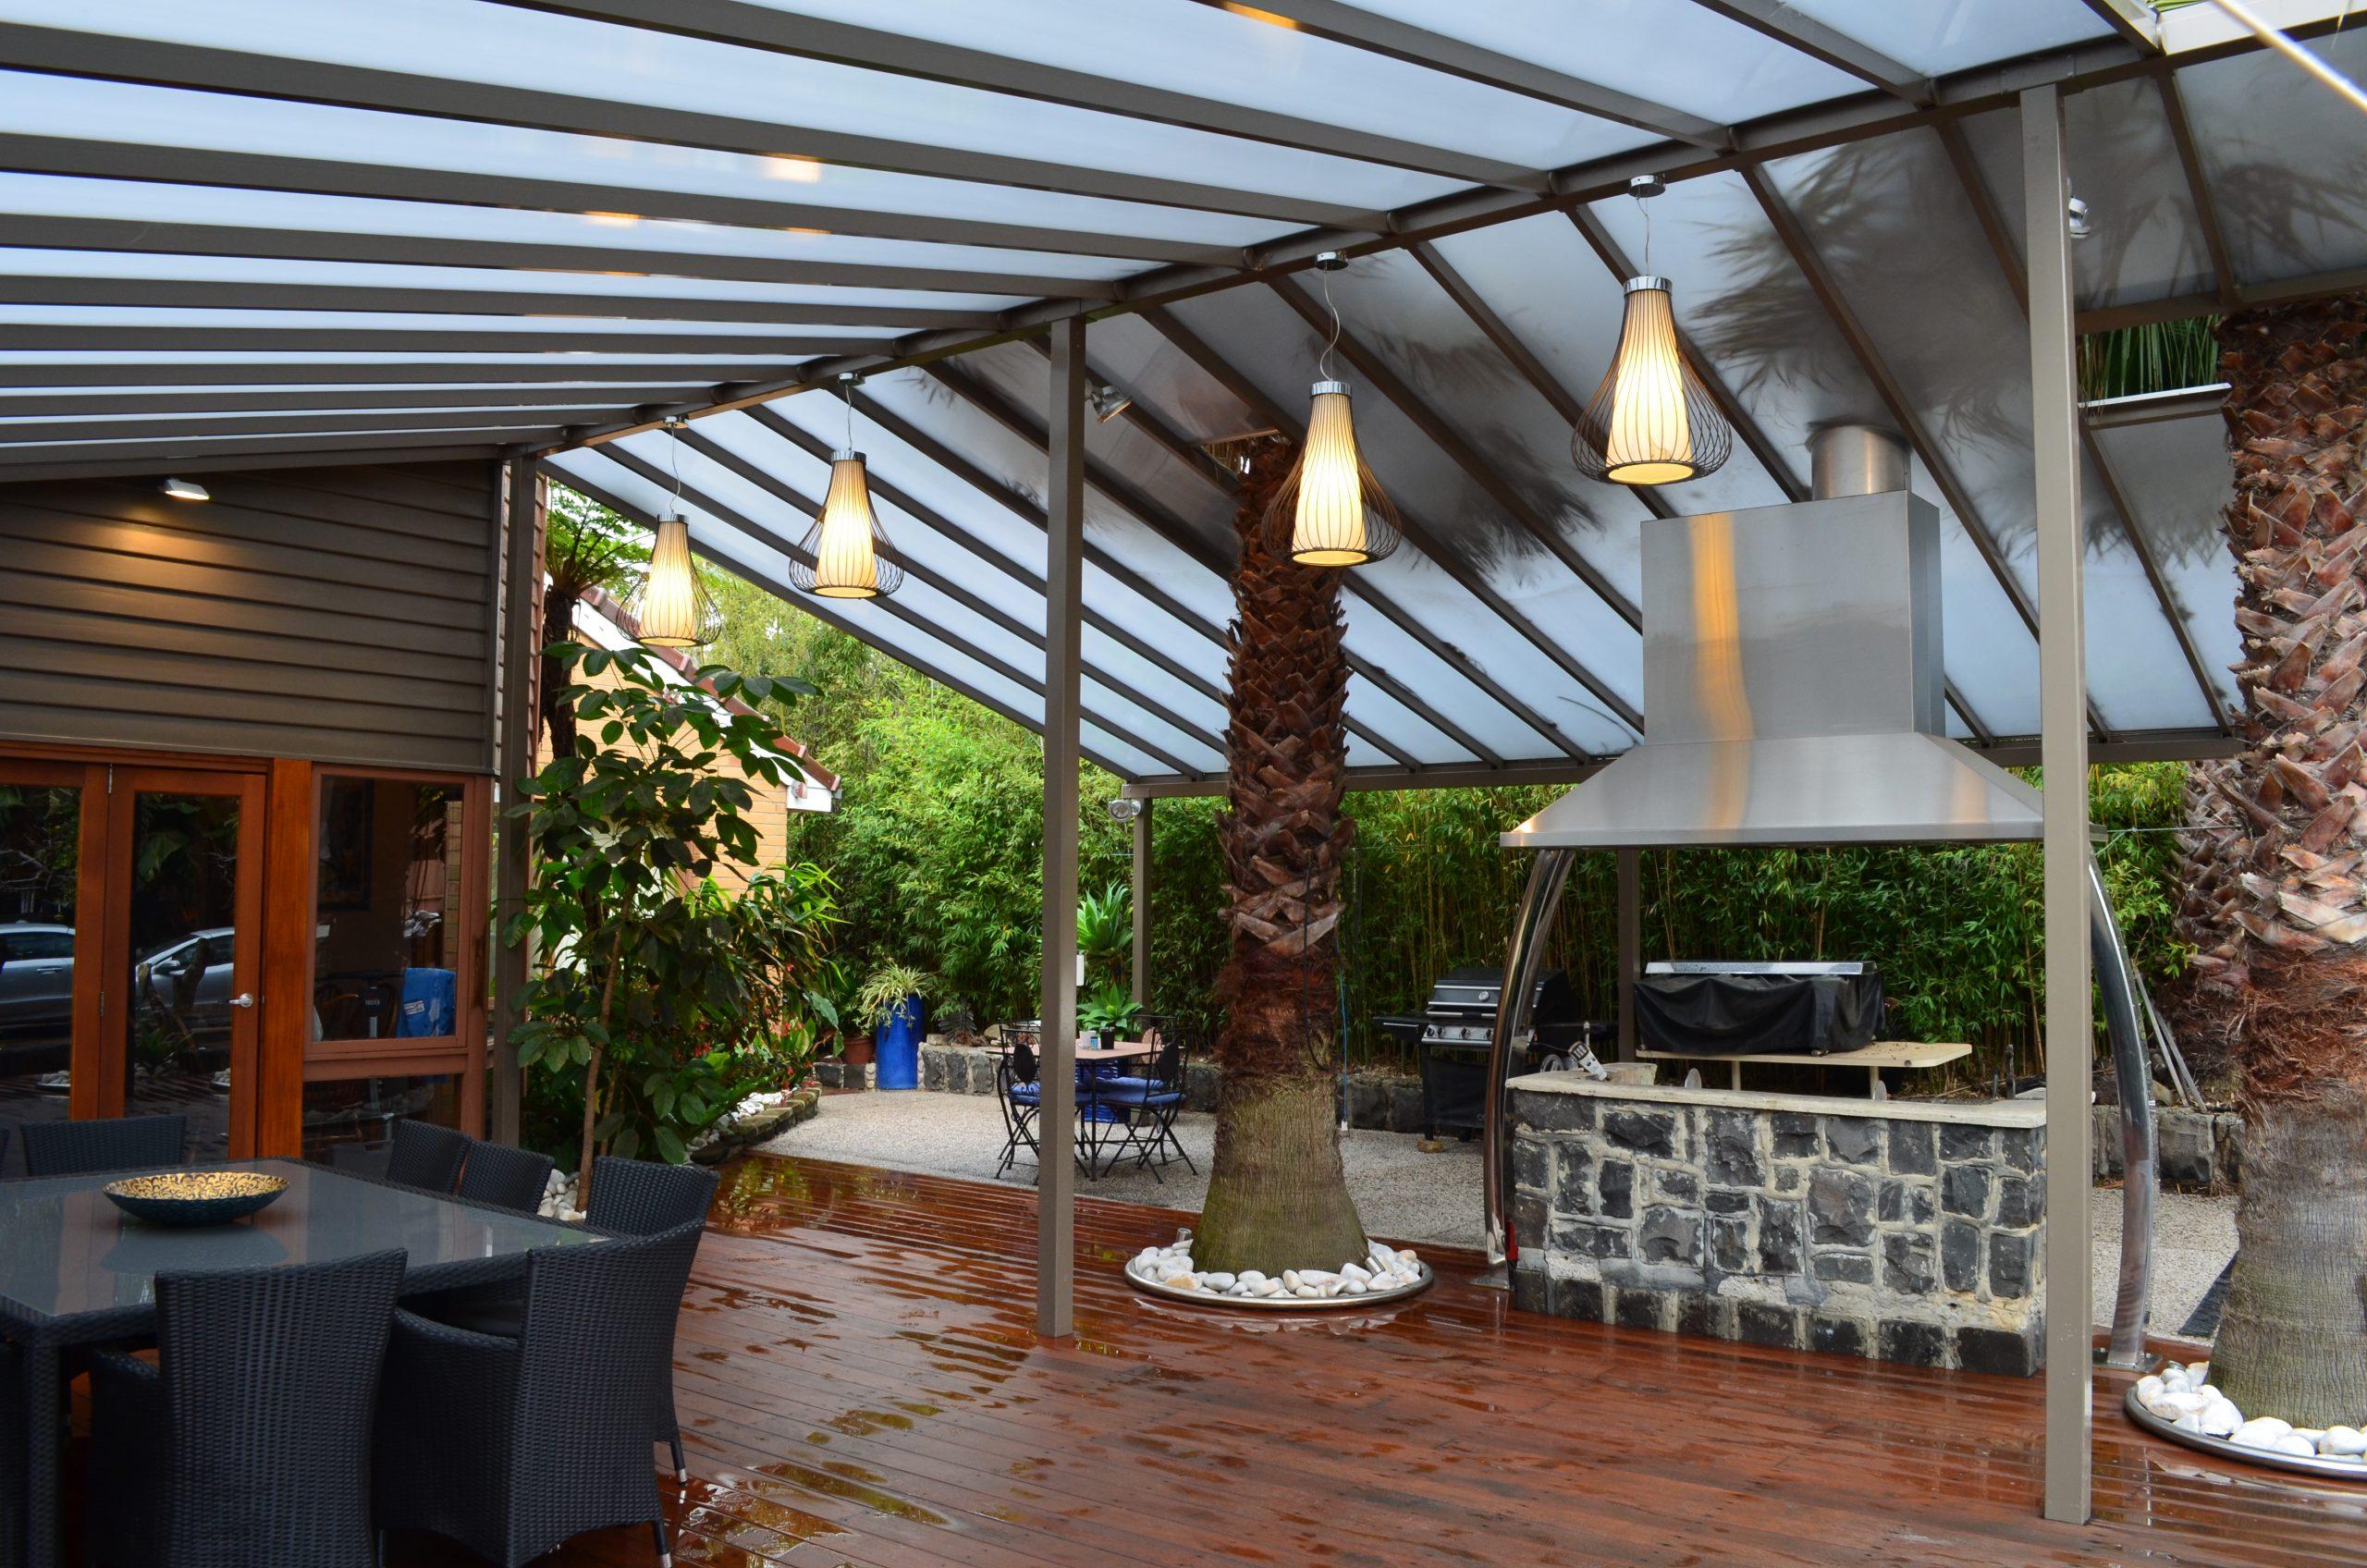 patios Melbourne